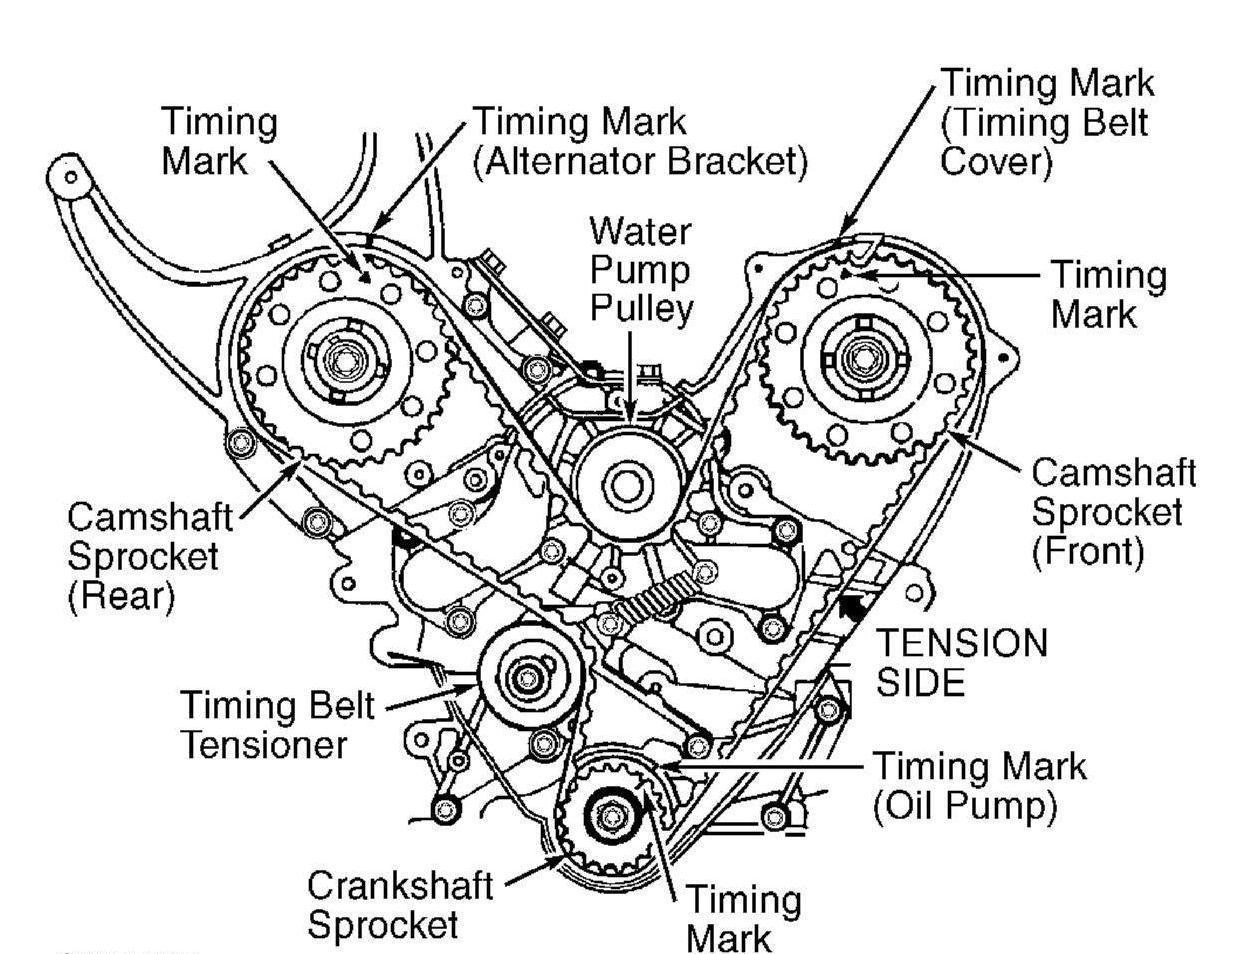 Mitsubishi Eclipse Timing Belt Diagram